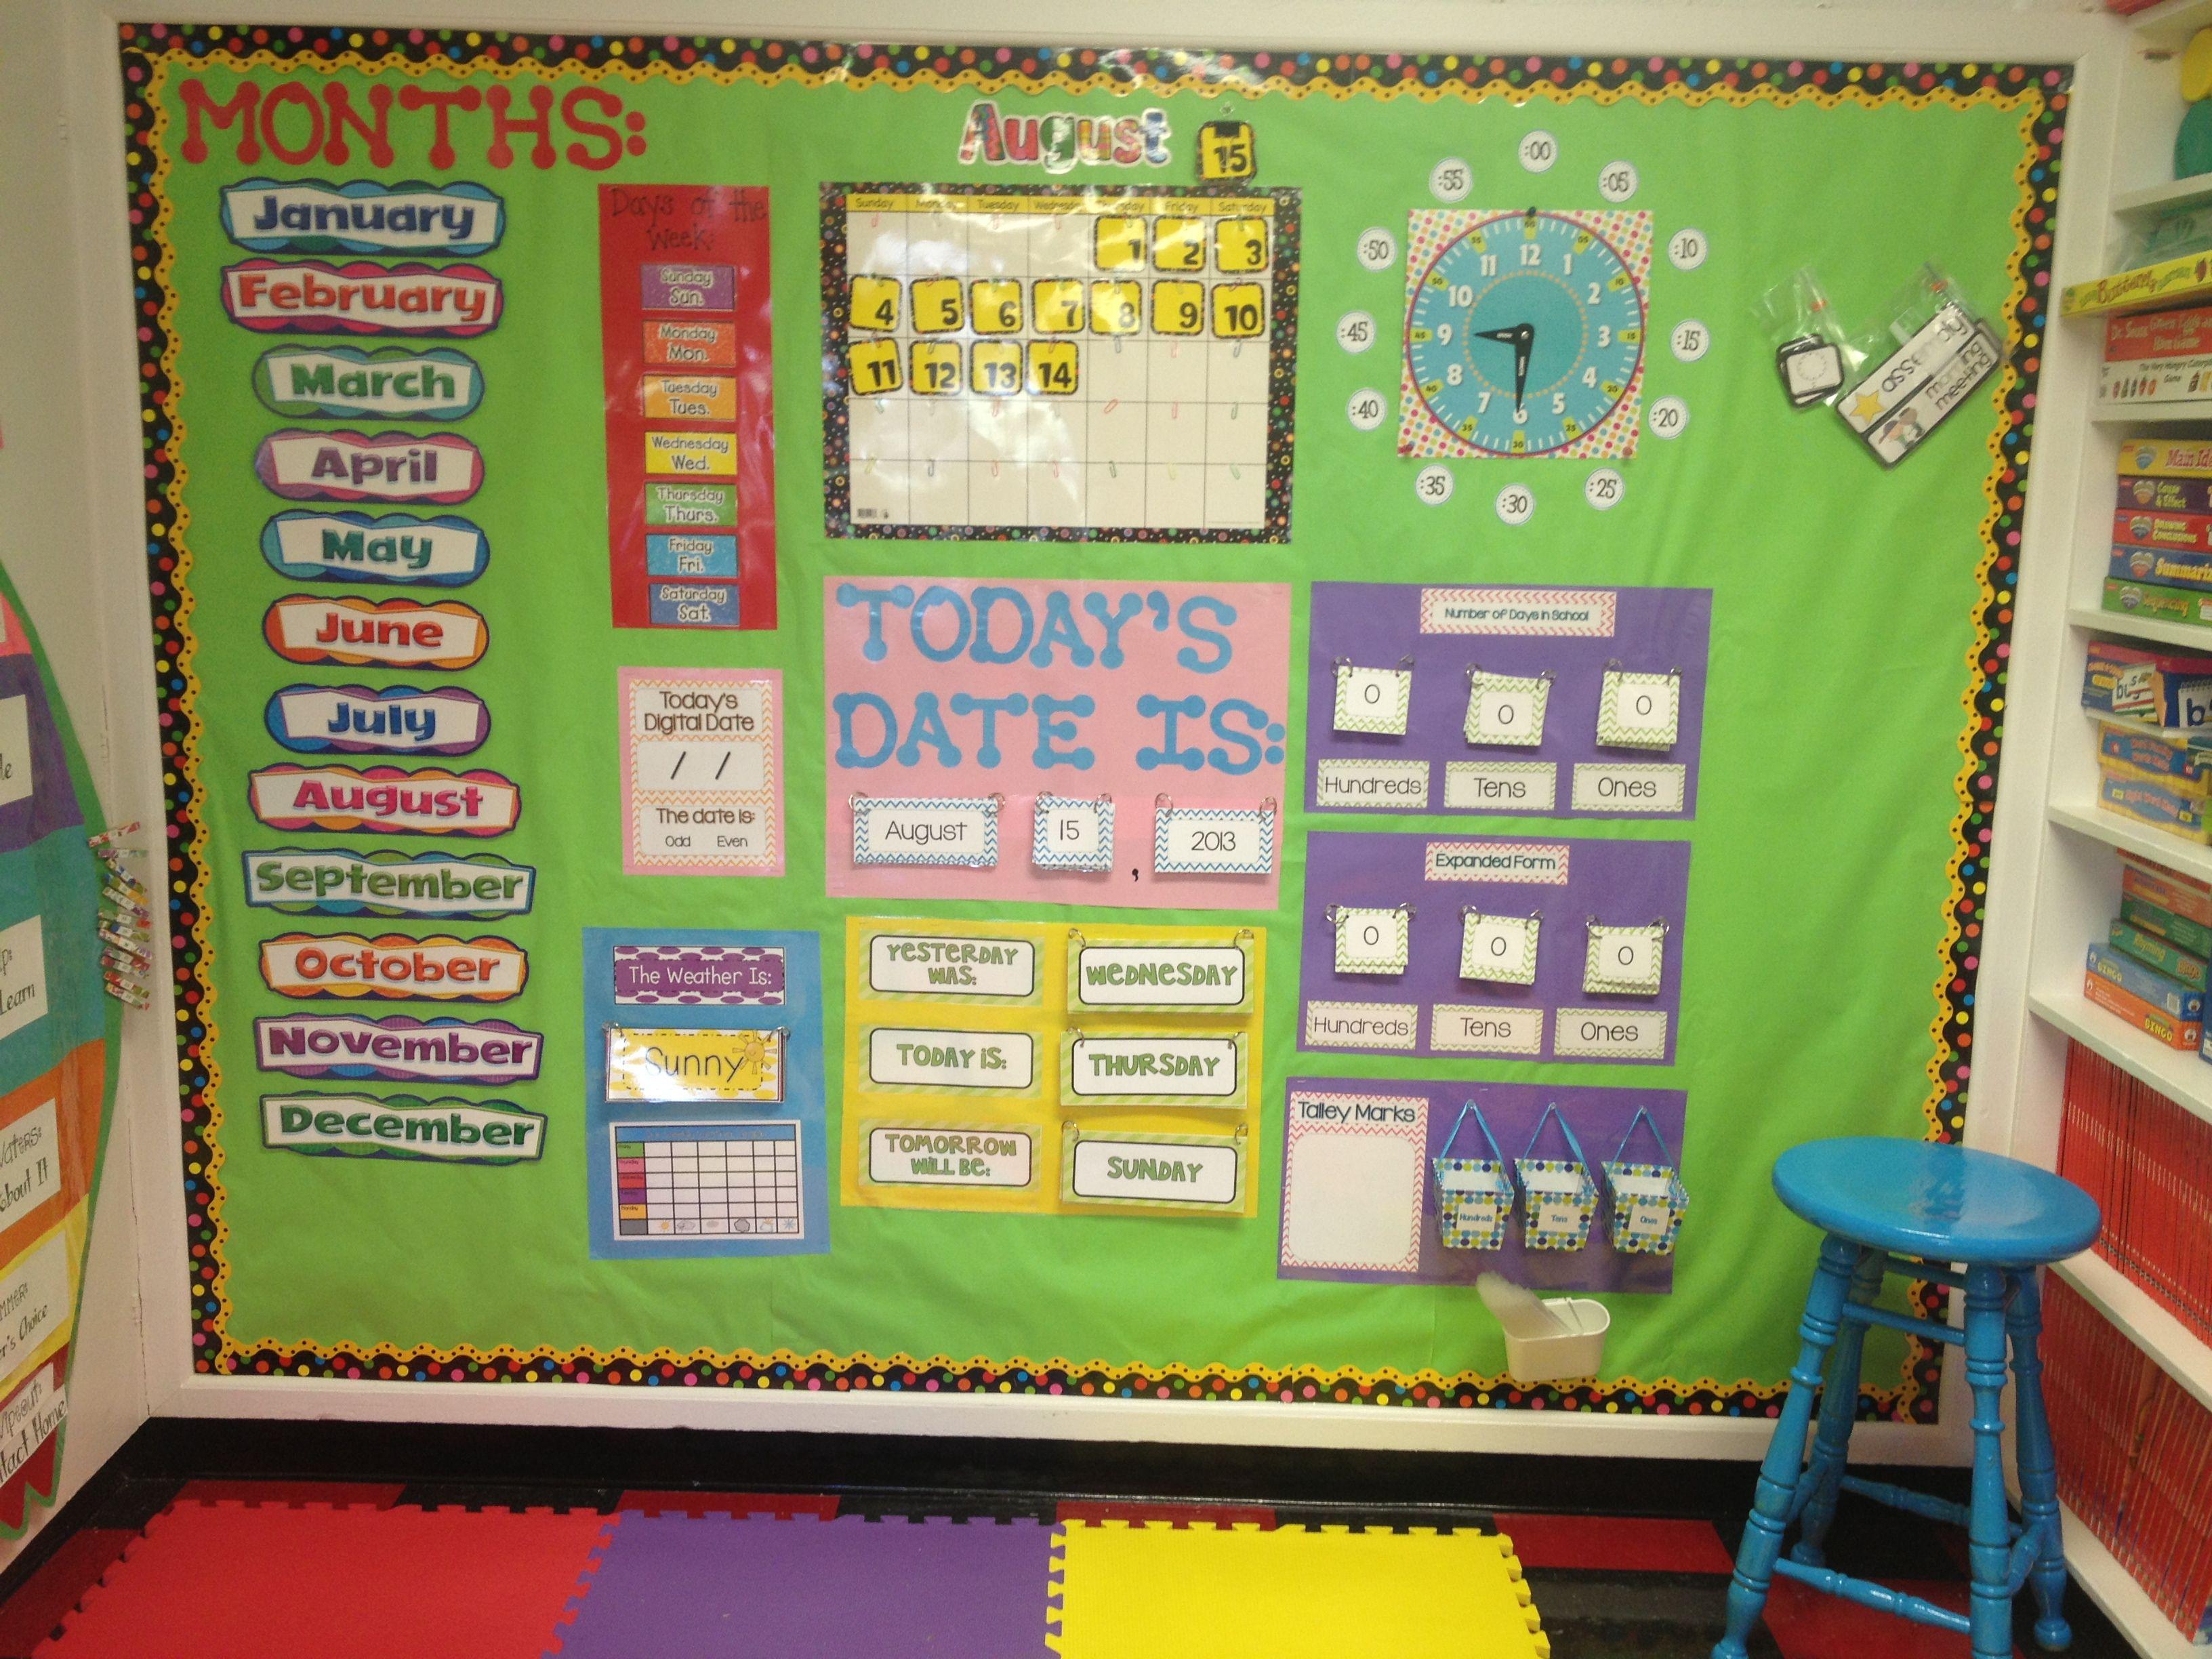 Calendar Ideas Y : Calendar math board ideas para el aula pinterest